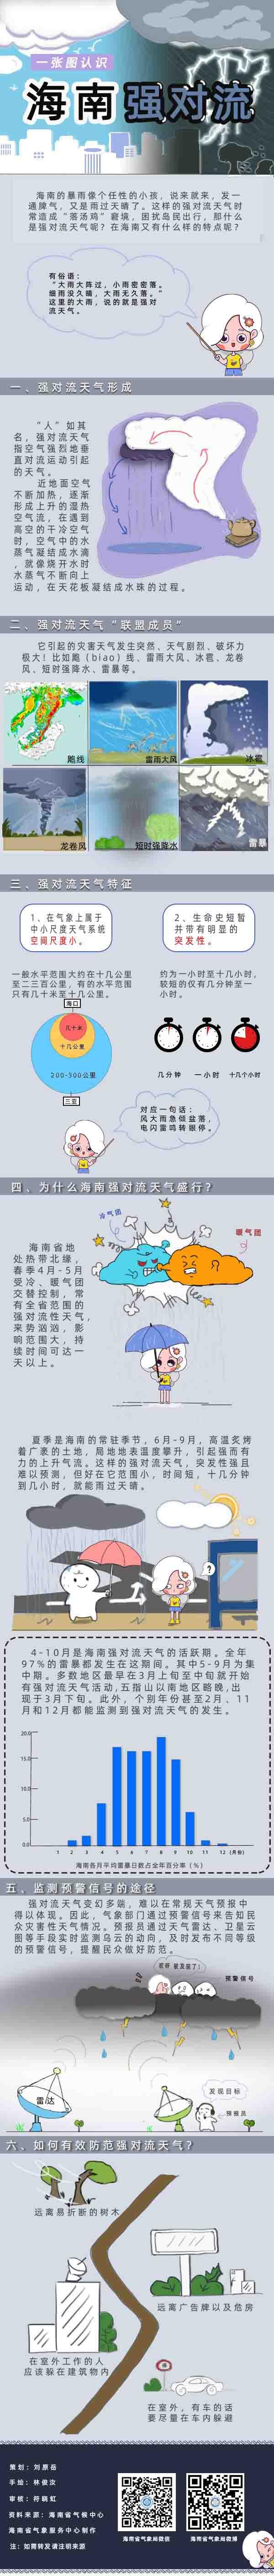 http://i.weather.com.cn/images/hainan/newzt/zt2019new/2021/04/29/1619663624276087359.jpg